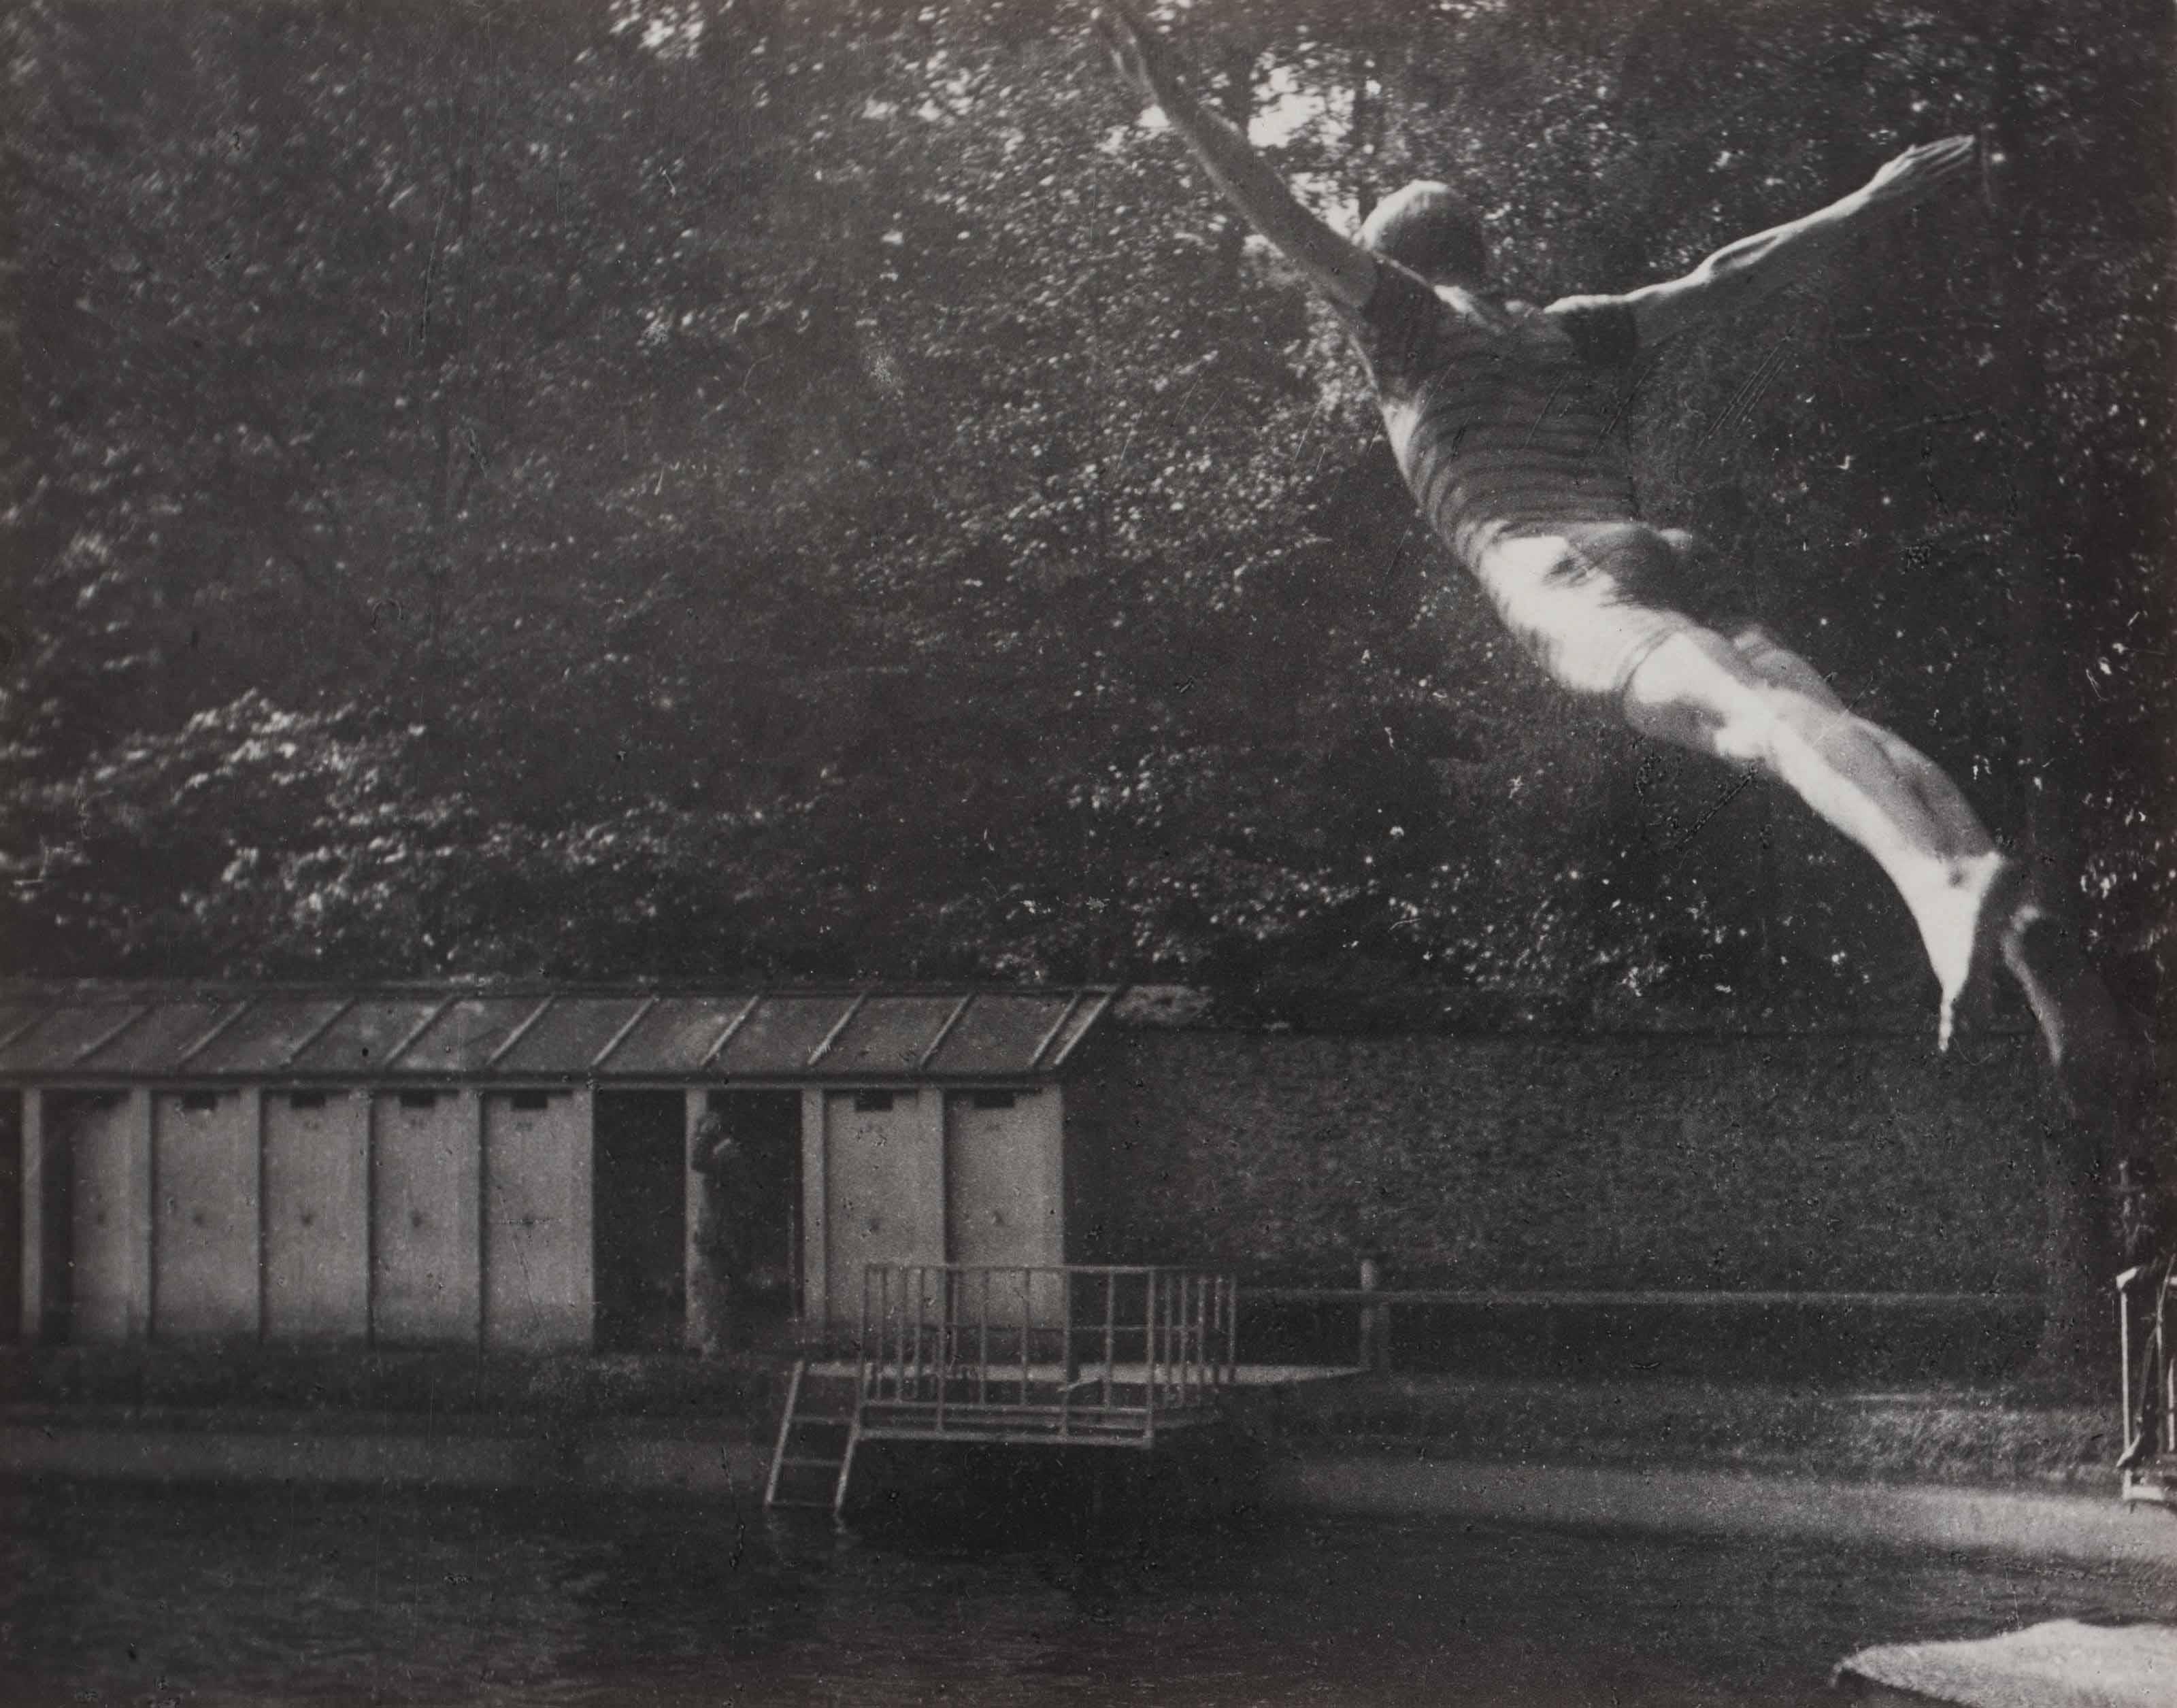 Plongeur, Rouzat, c. 1908